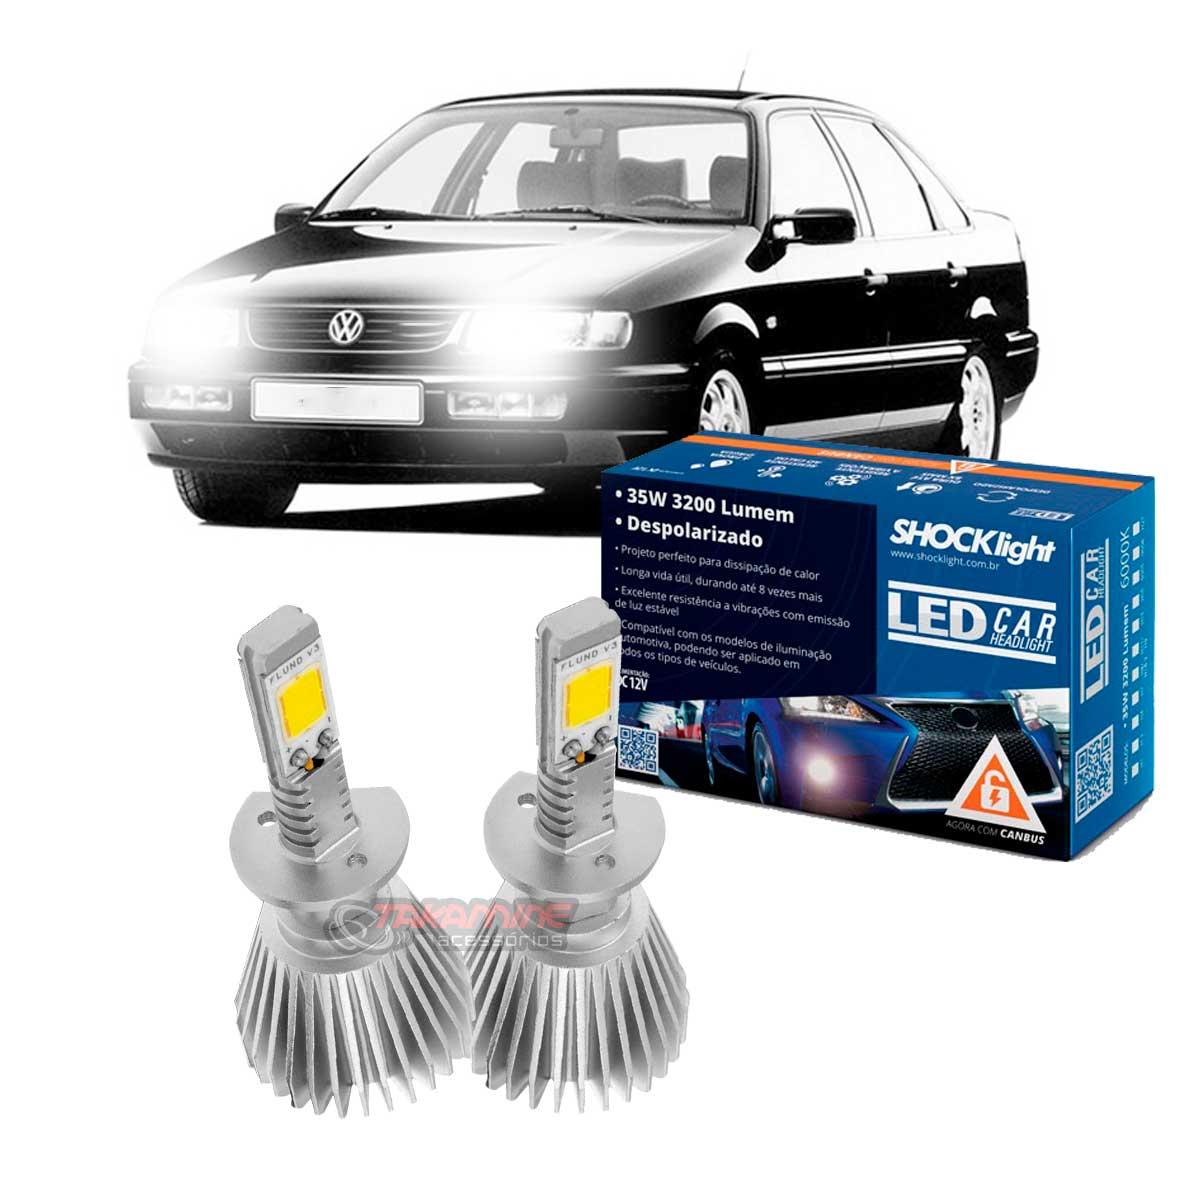 Kit LED Passat 1993 1994 1995 1996 1997 tipo xenon para farol baixo H1 35W Headlight